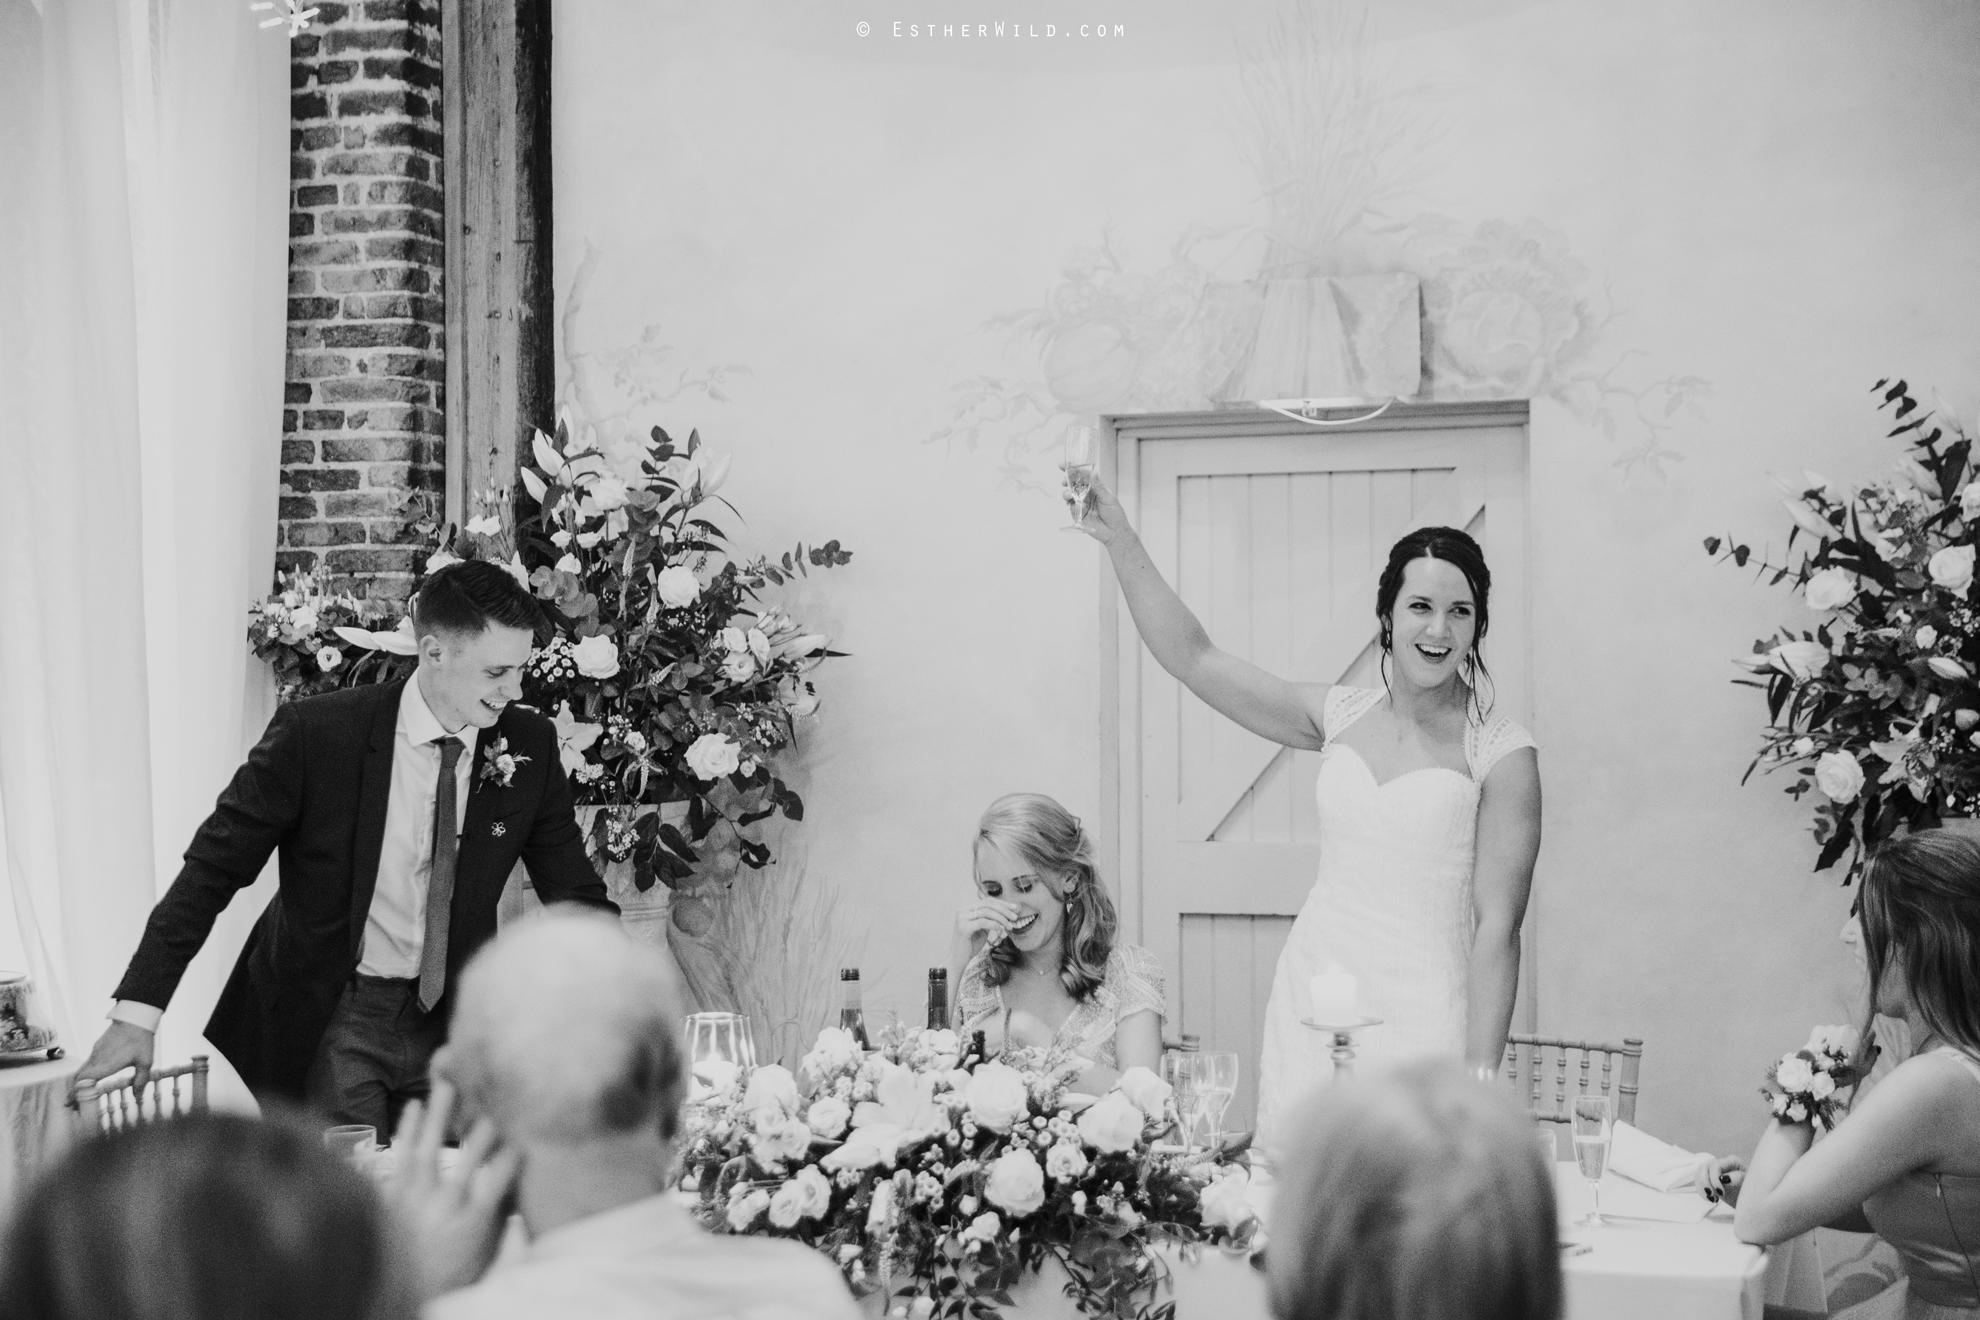 Elms_Barn_Weddings_Suffolk_Photographer_Copyright_Esther_Wild_IMG_2942-2.jpg